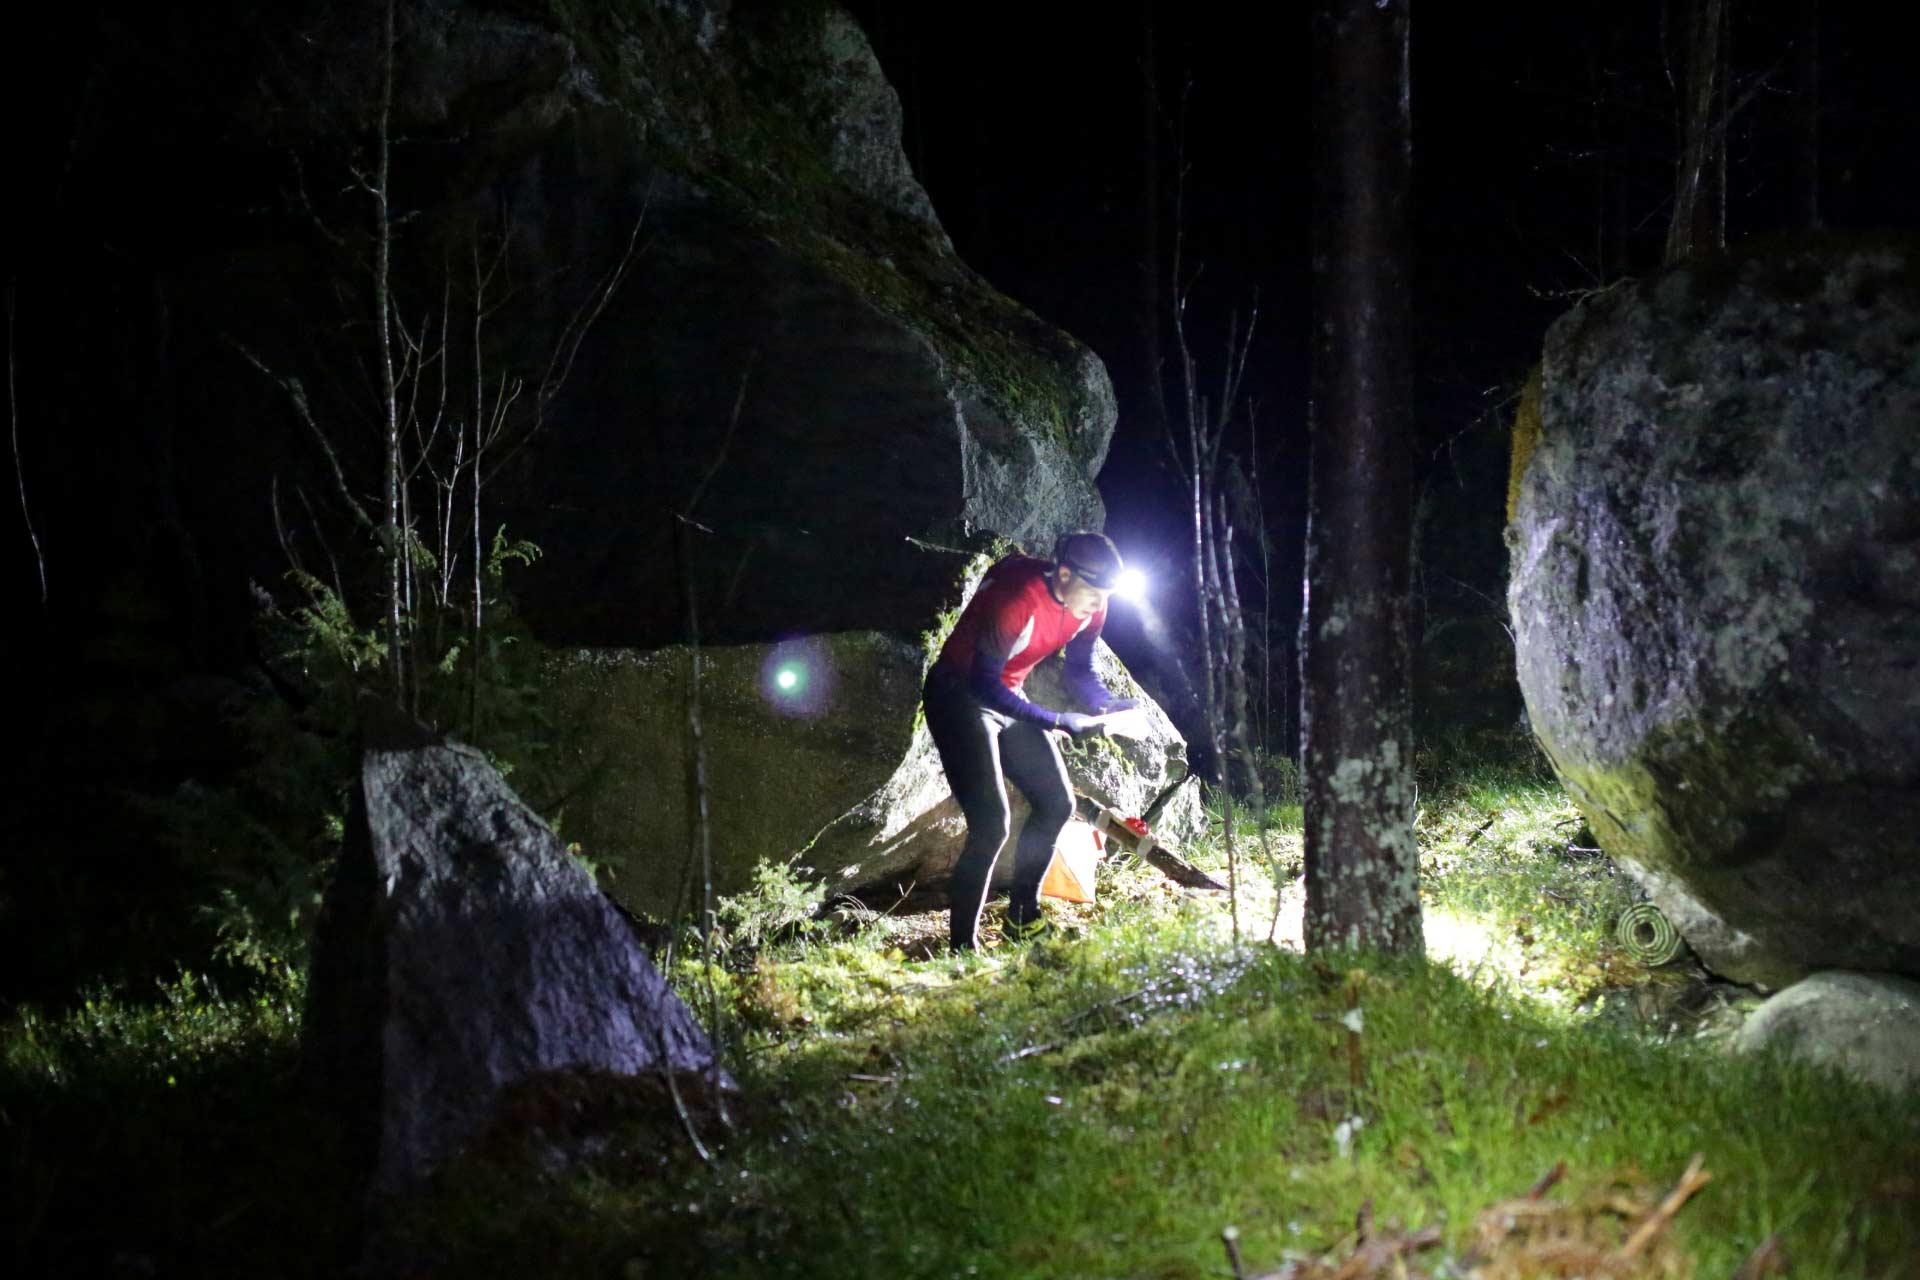 Lumonite SM-yö 2019 Himoksella